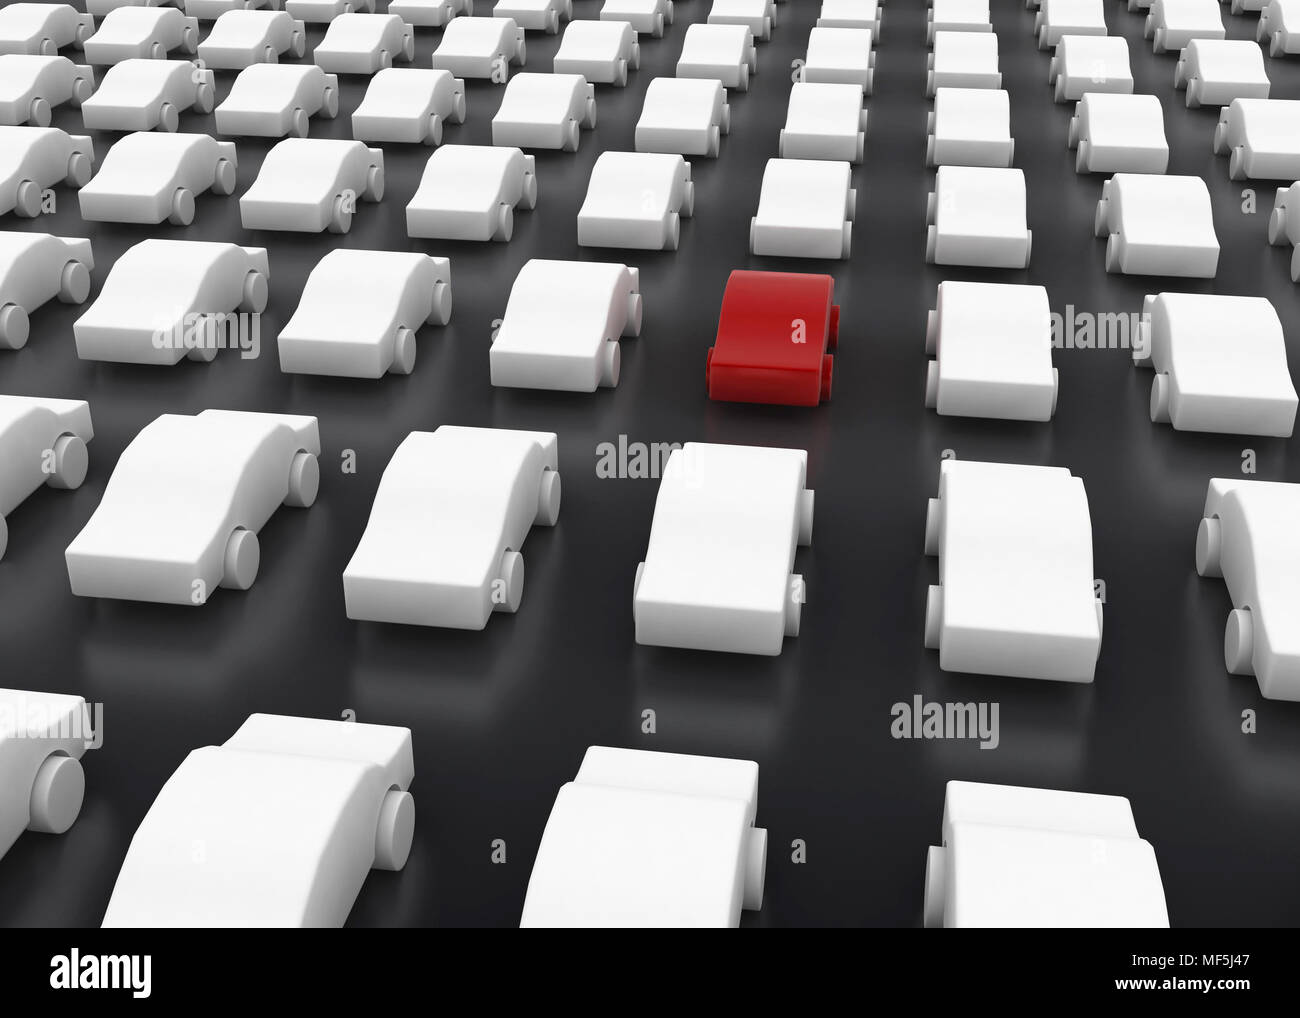 Rows of 3d car symbols, horizontal - Stock Image